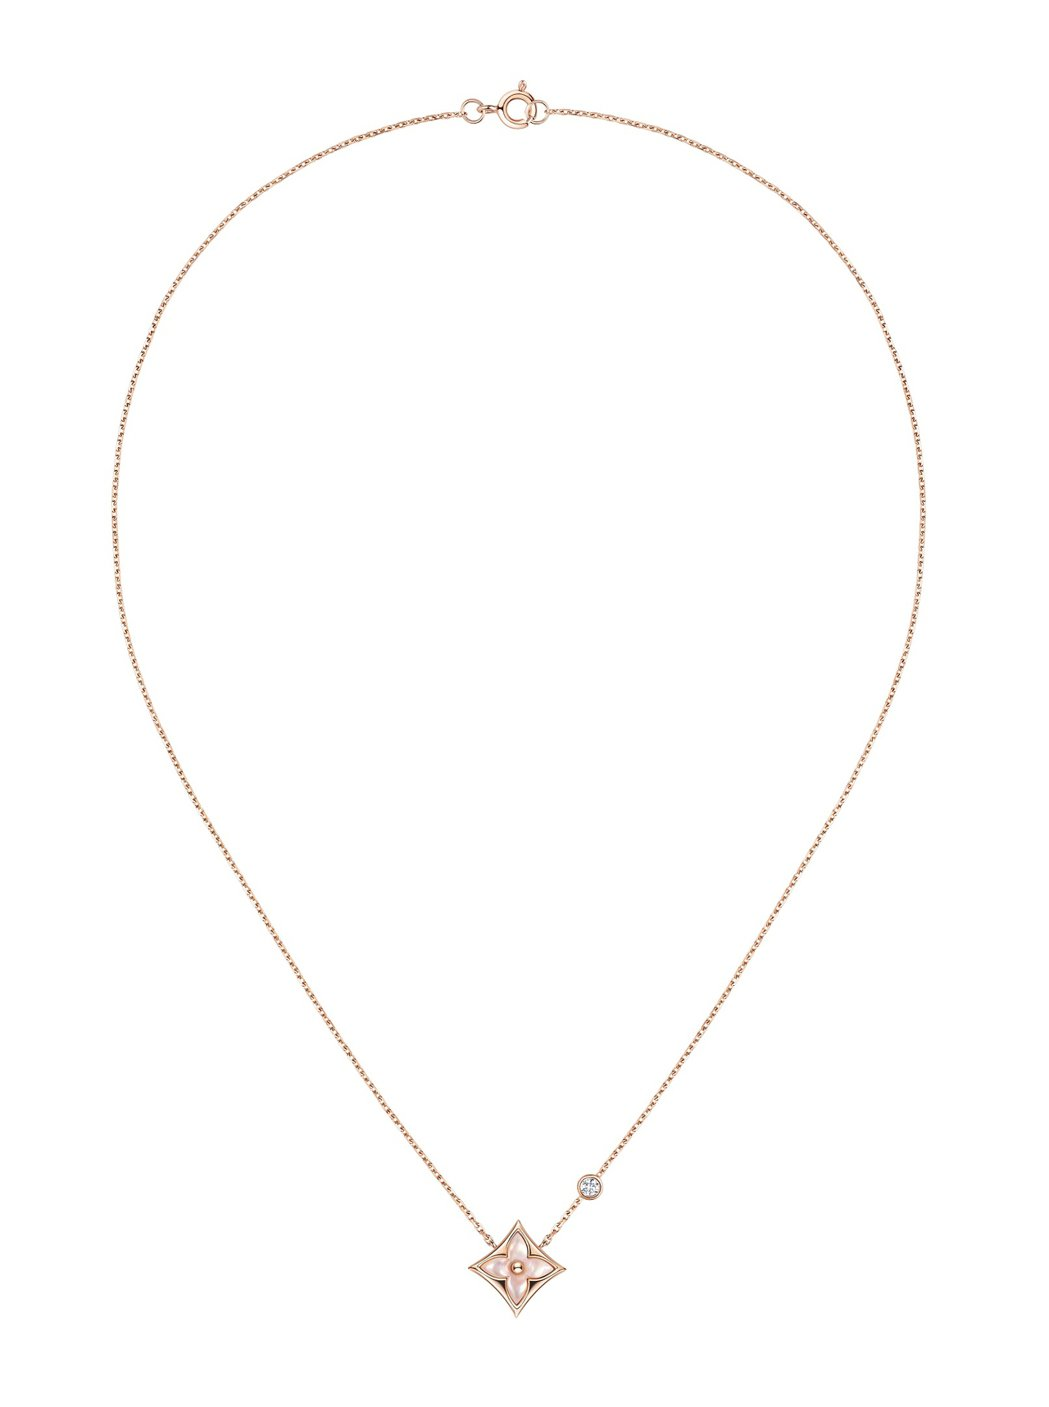 Star Blossom珍珠母貝項鍊,76,500。圖/LV提供